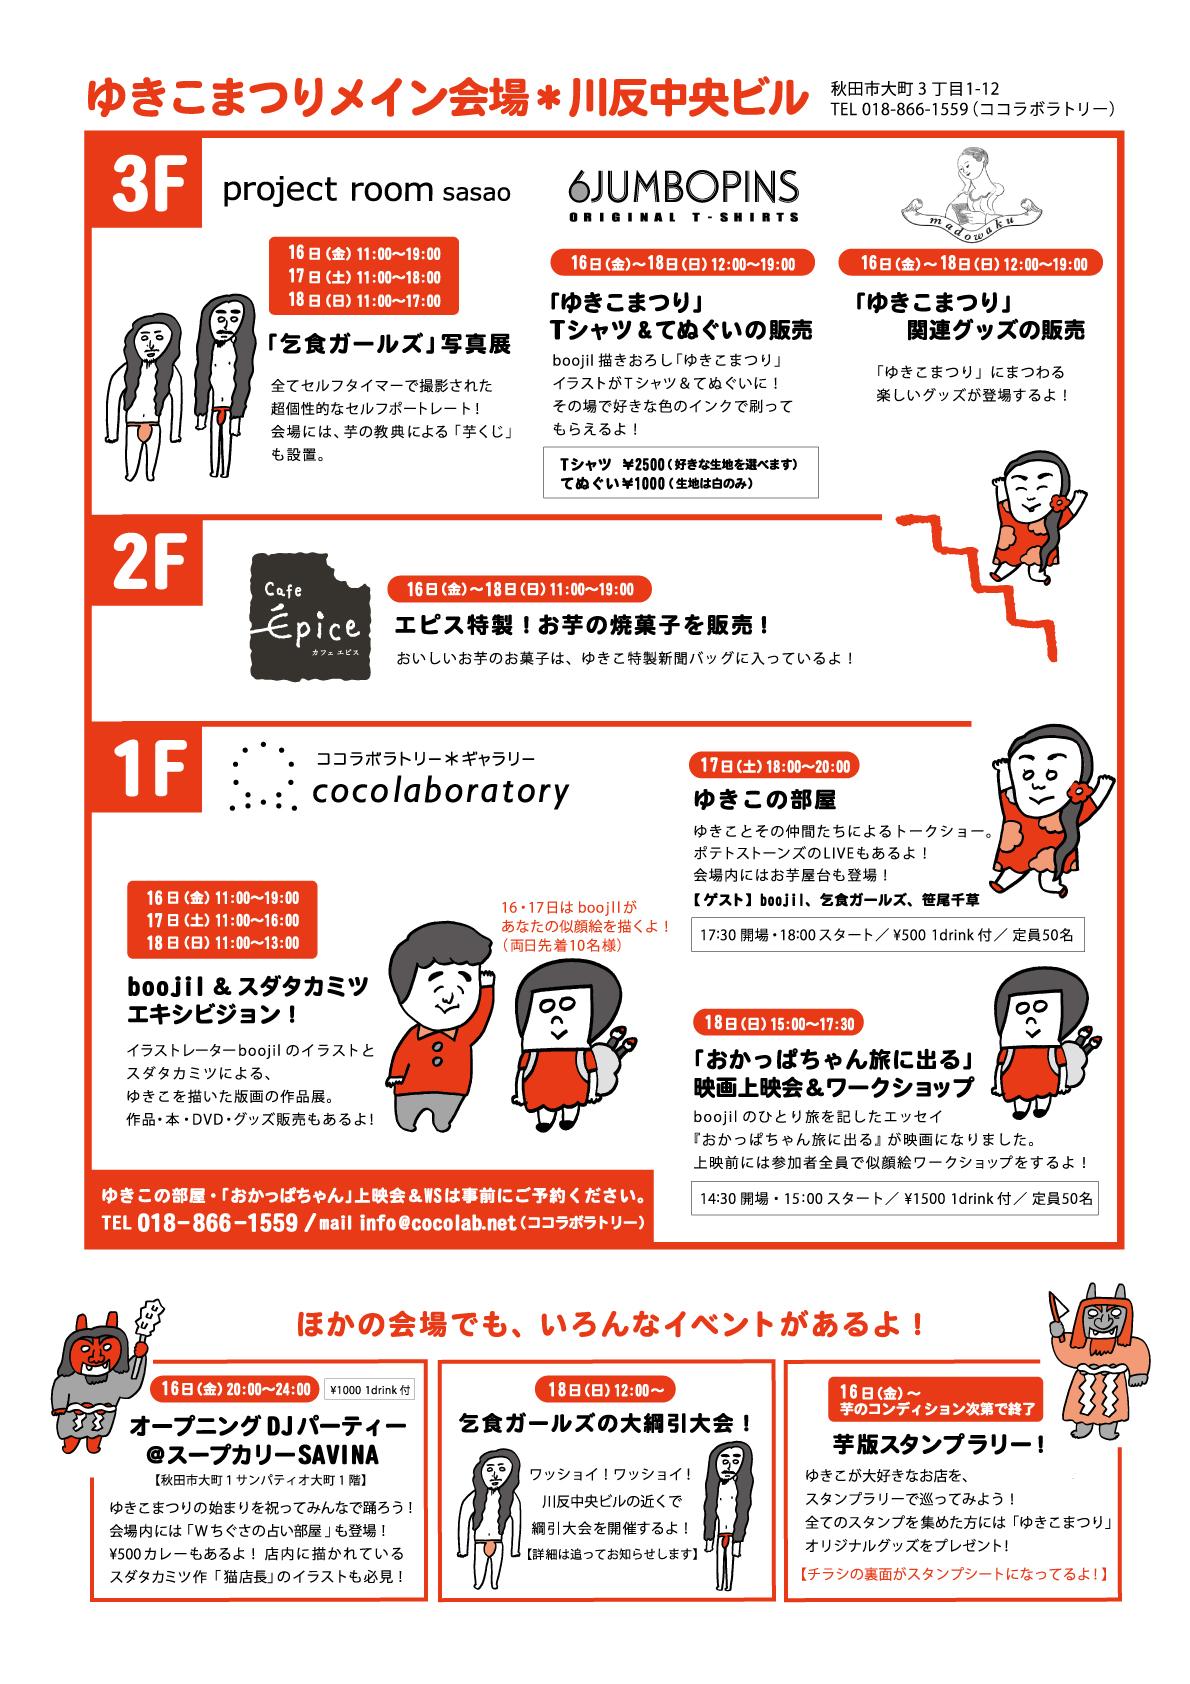 http://www.boojil.com/news/img/2012/02/yukikofes2.jpg